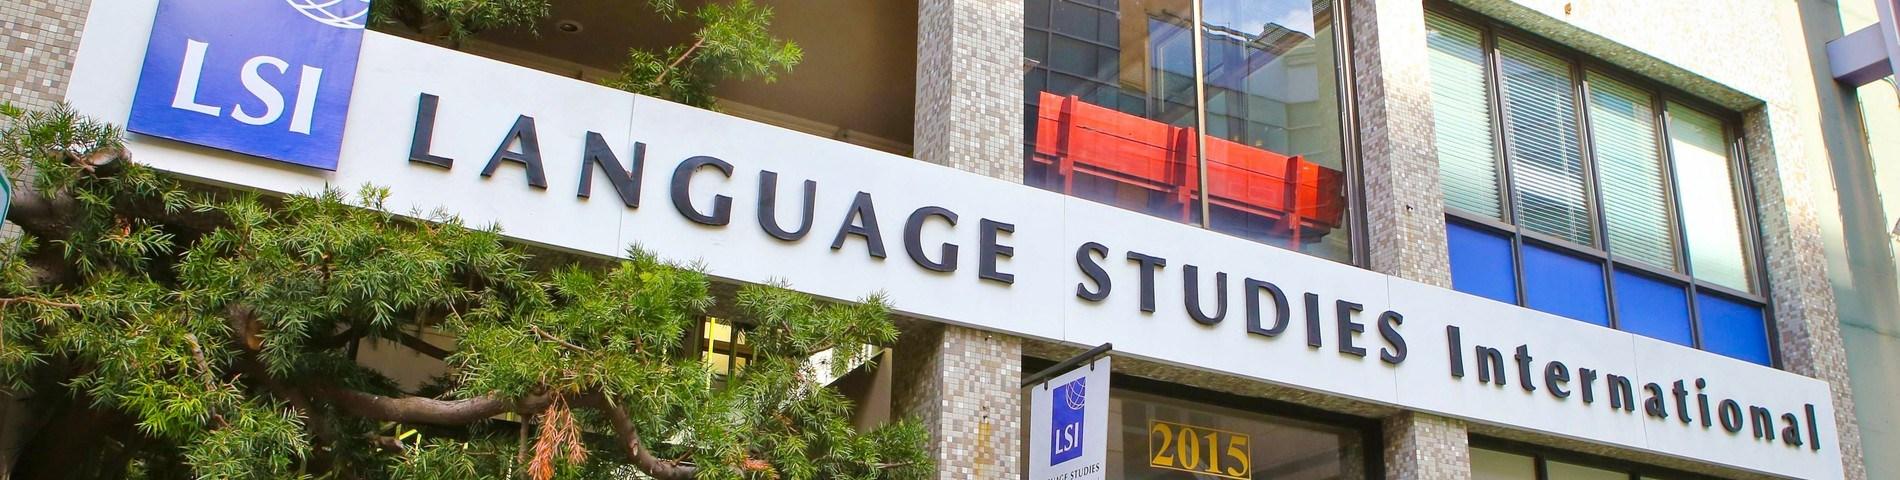 LSI - Language Studies International picture 1